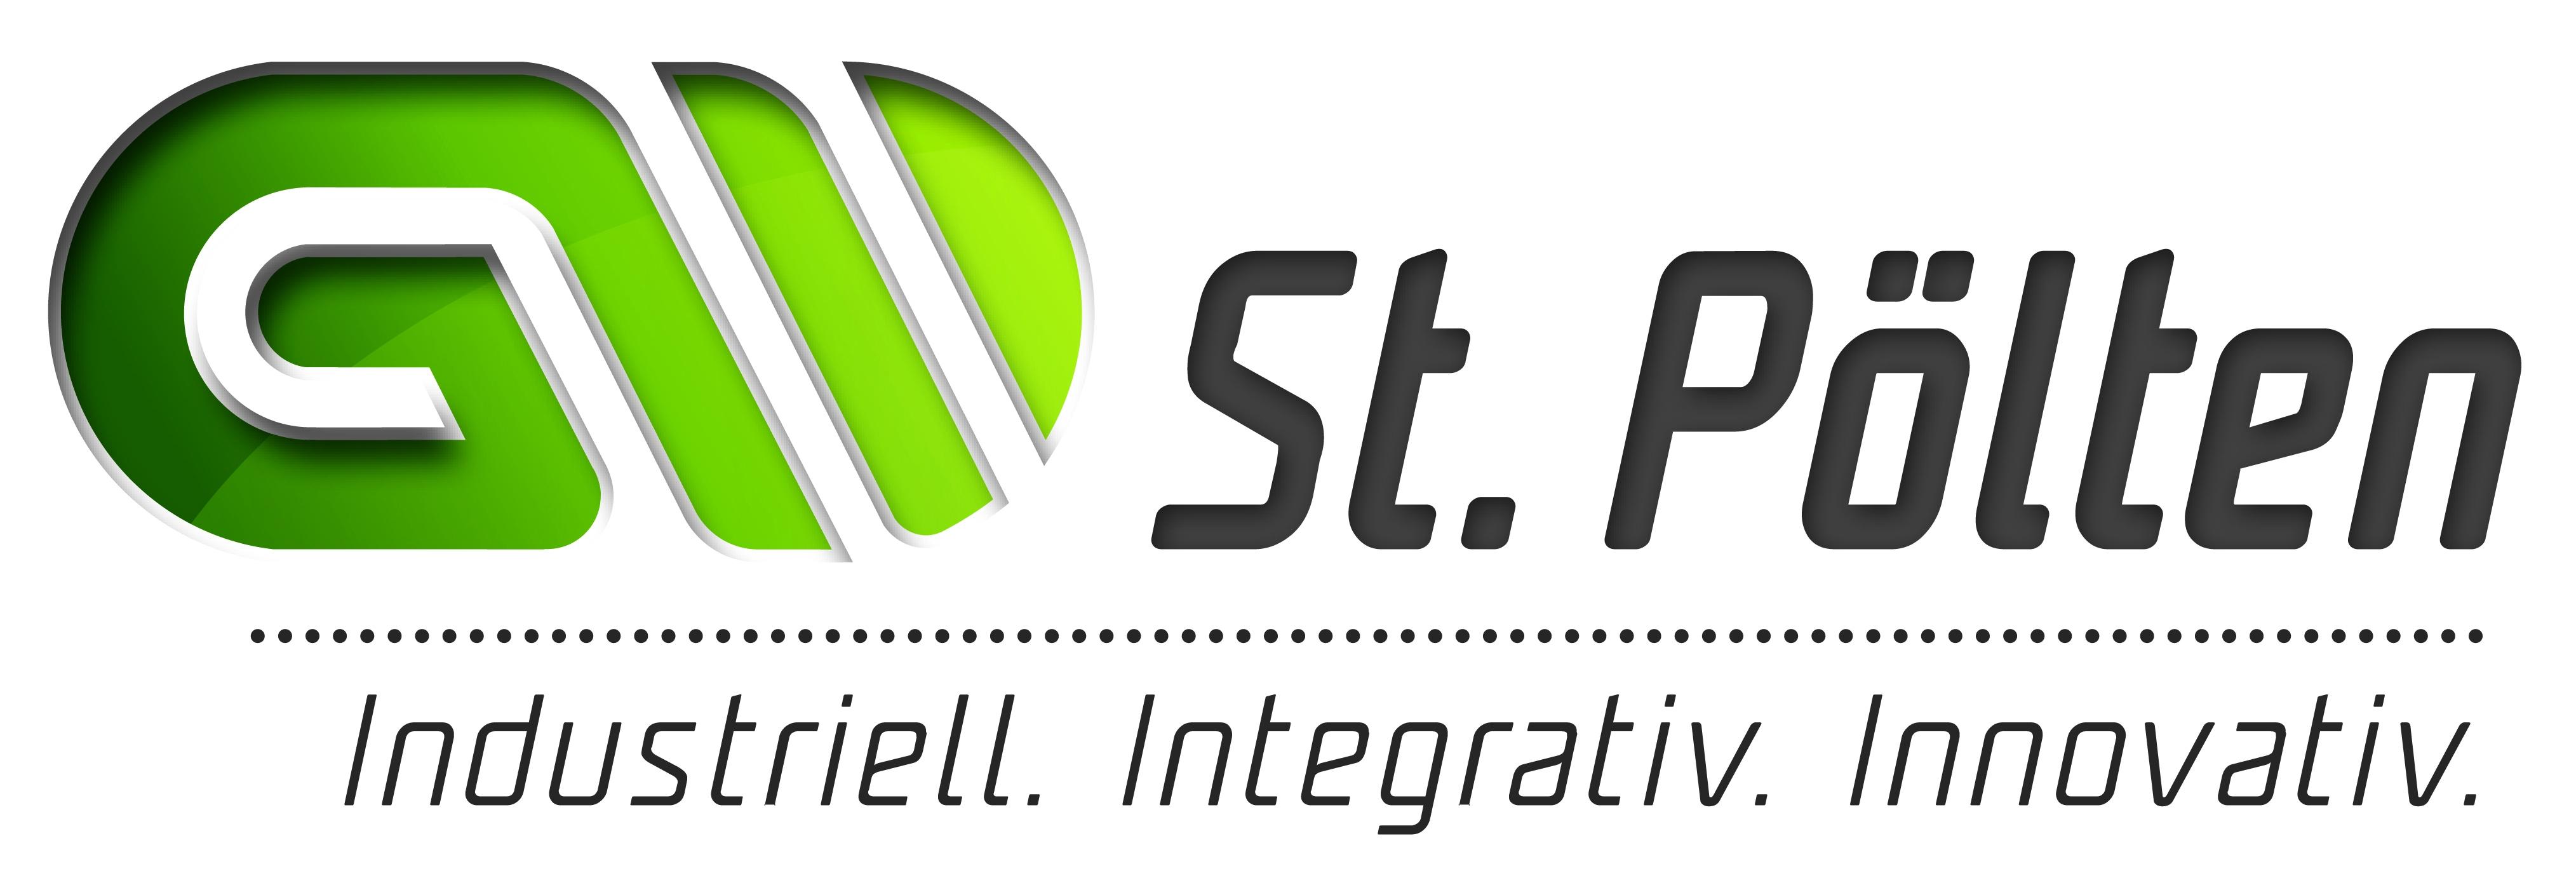 GW St Pölten Logo